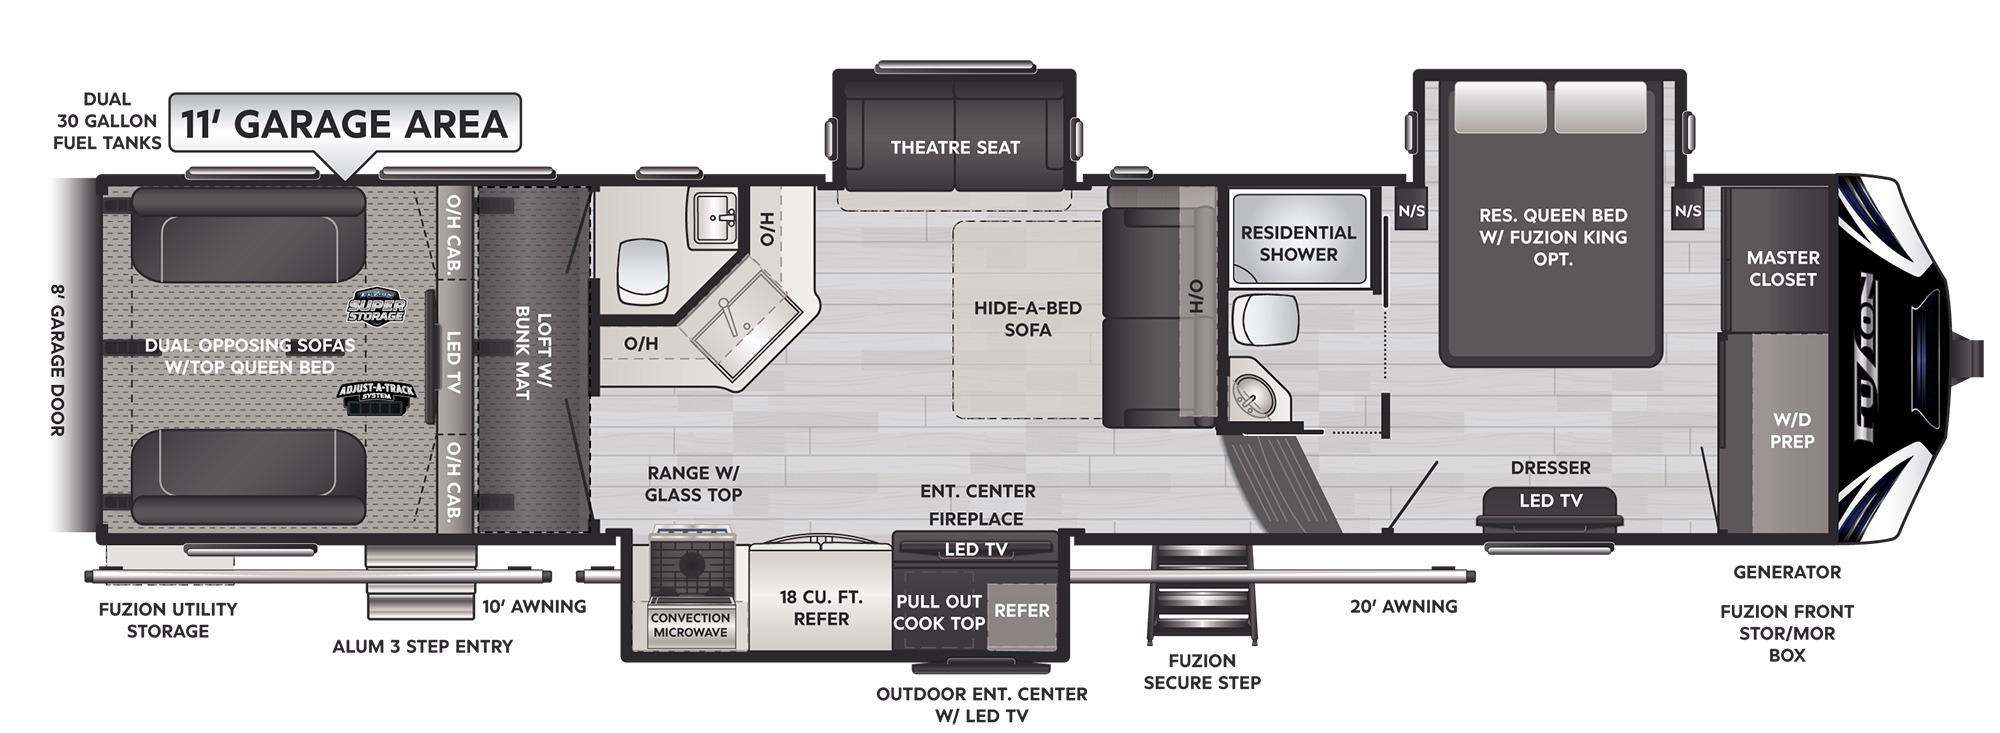 View Floor Plan for 2022 KEYSTONE FUZION 379